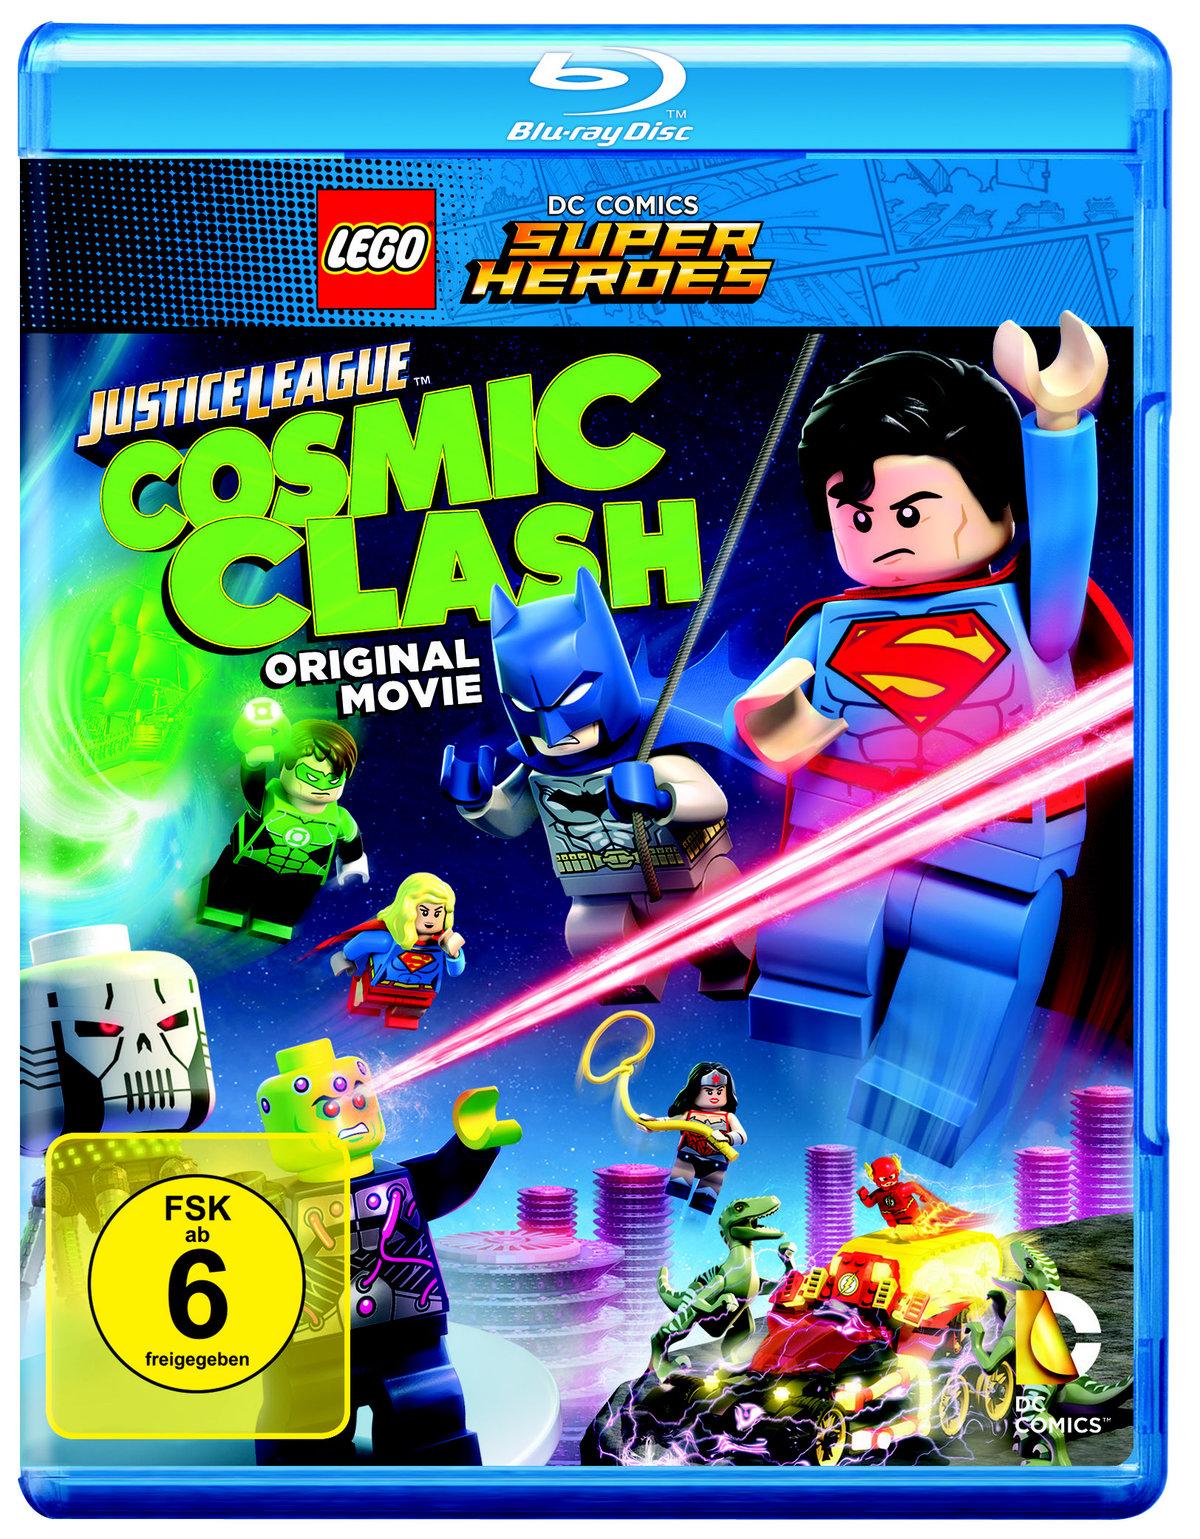 LEGO: DC Comics Super Heroes (2016) - Justice League: Cosmic Clash - Original Movie